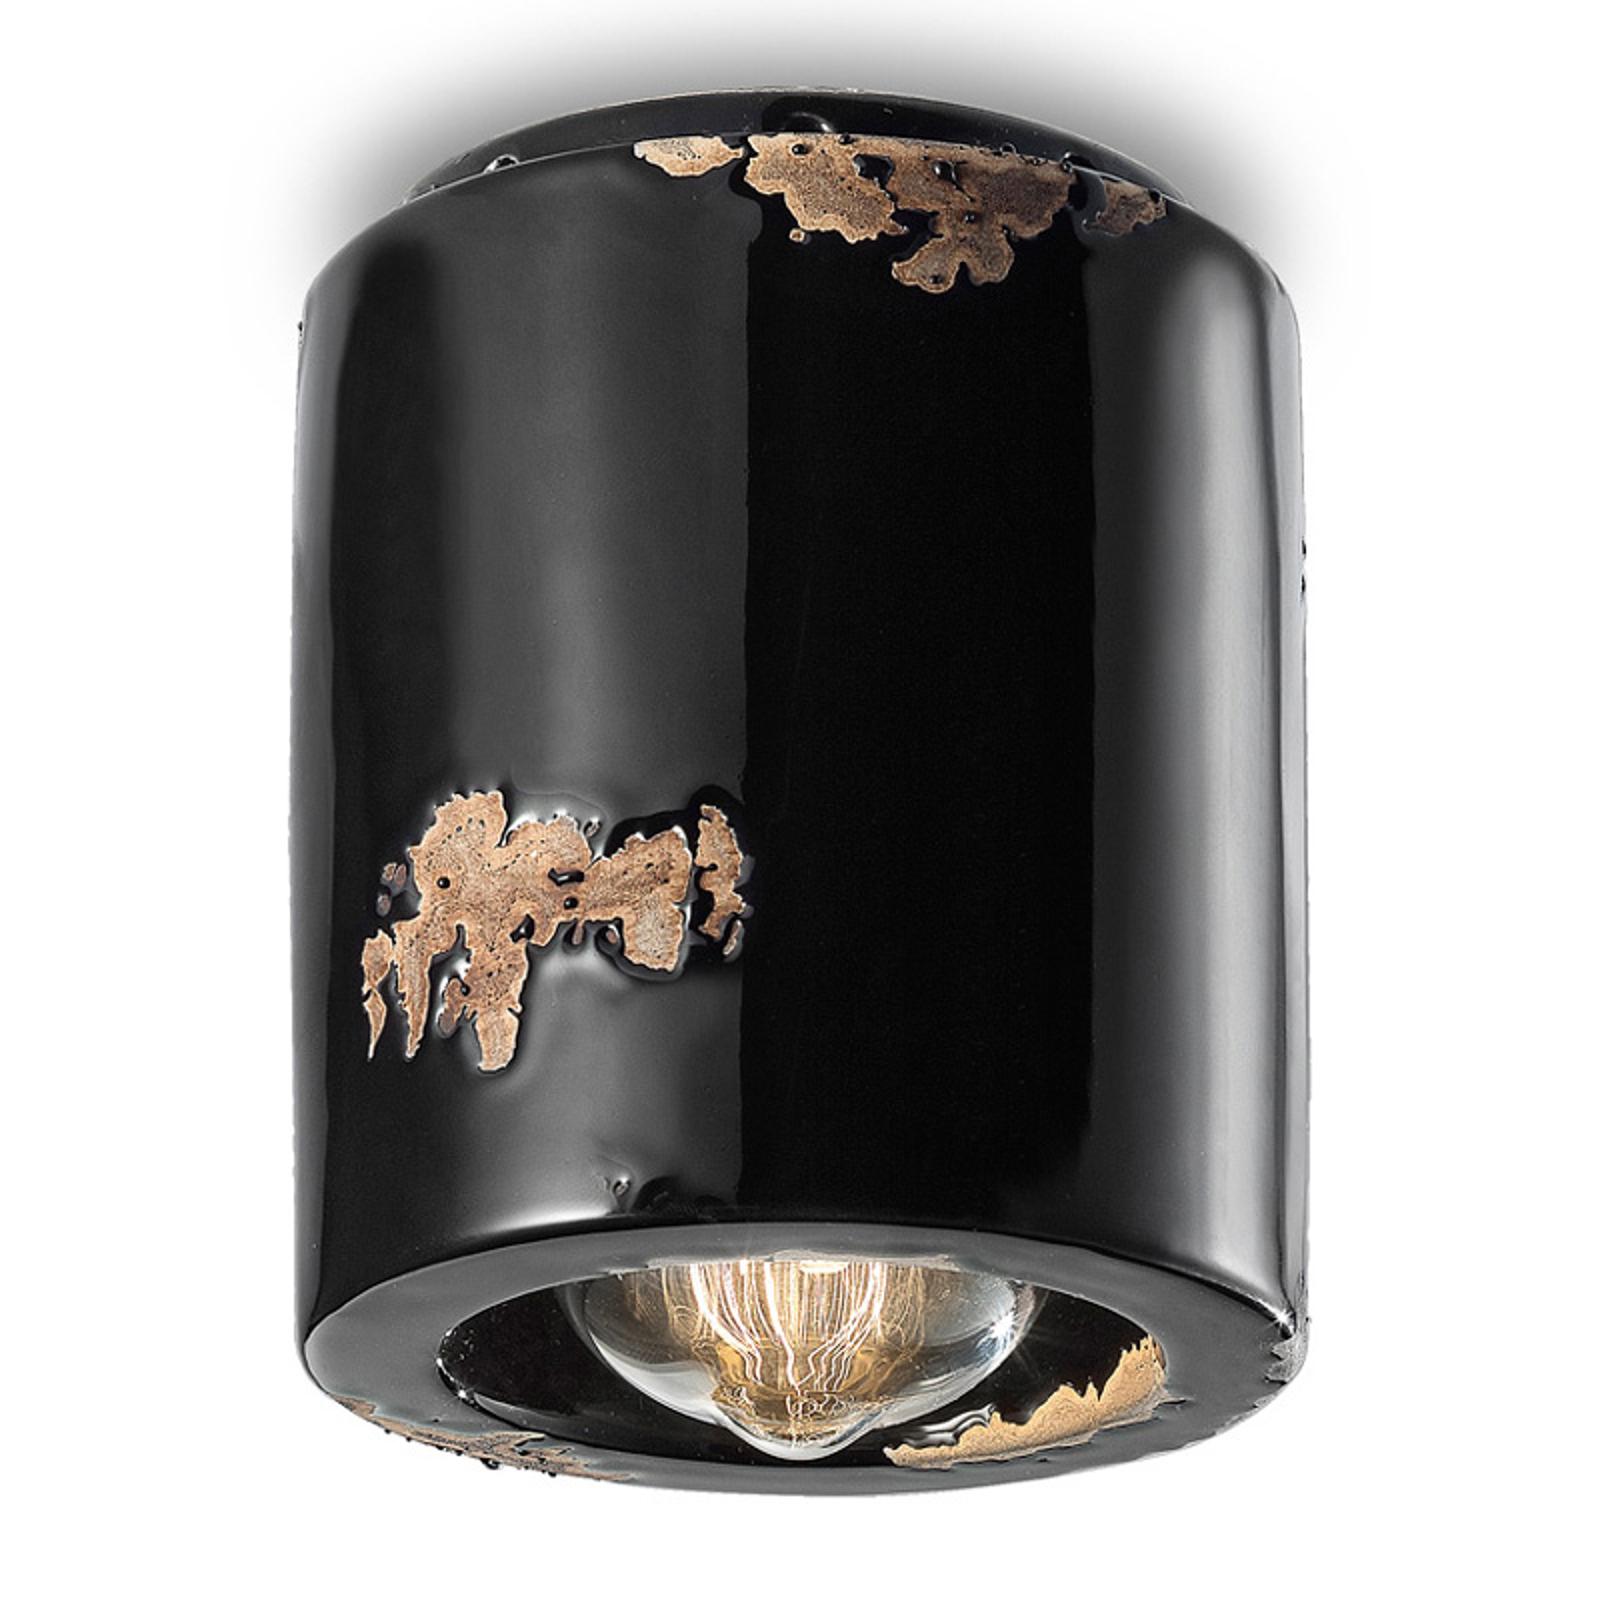 Plafondlamp C986 in vintage-stijl, zwart